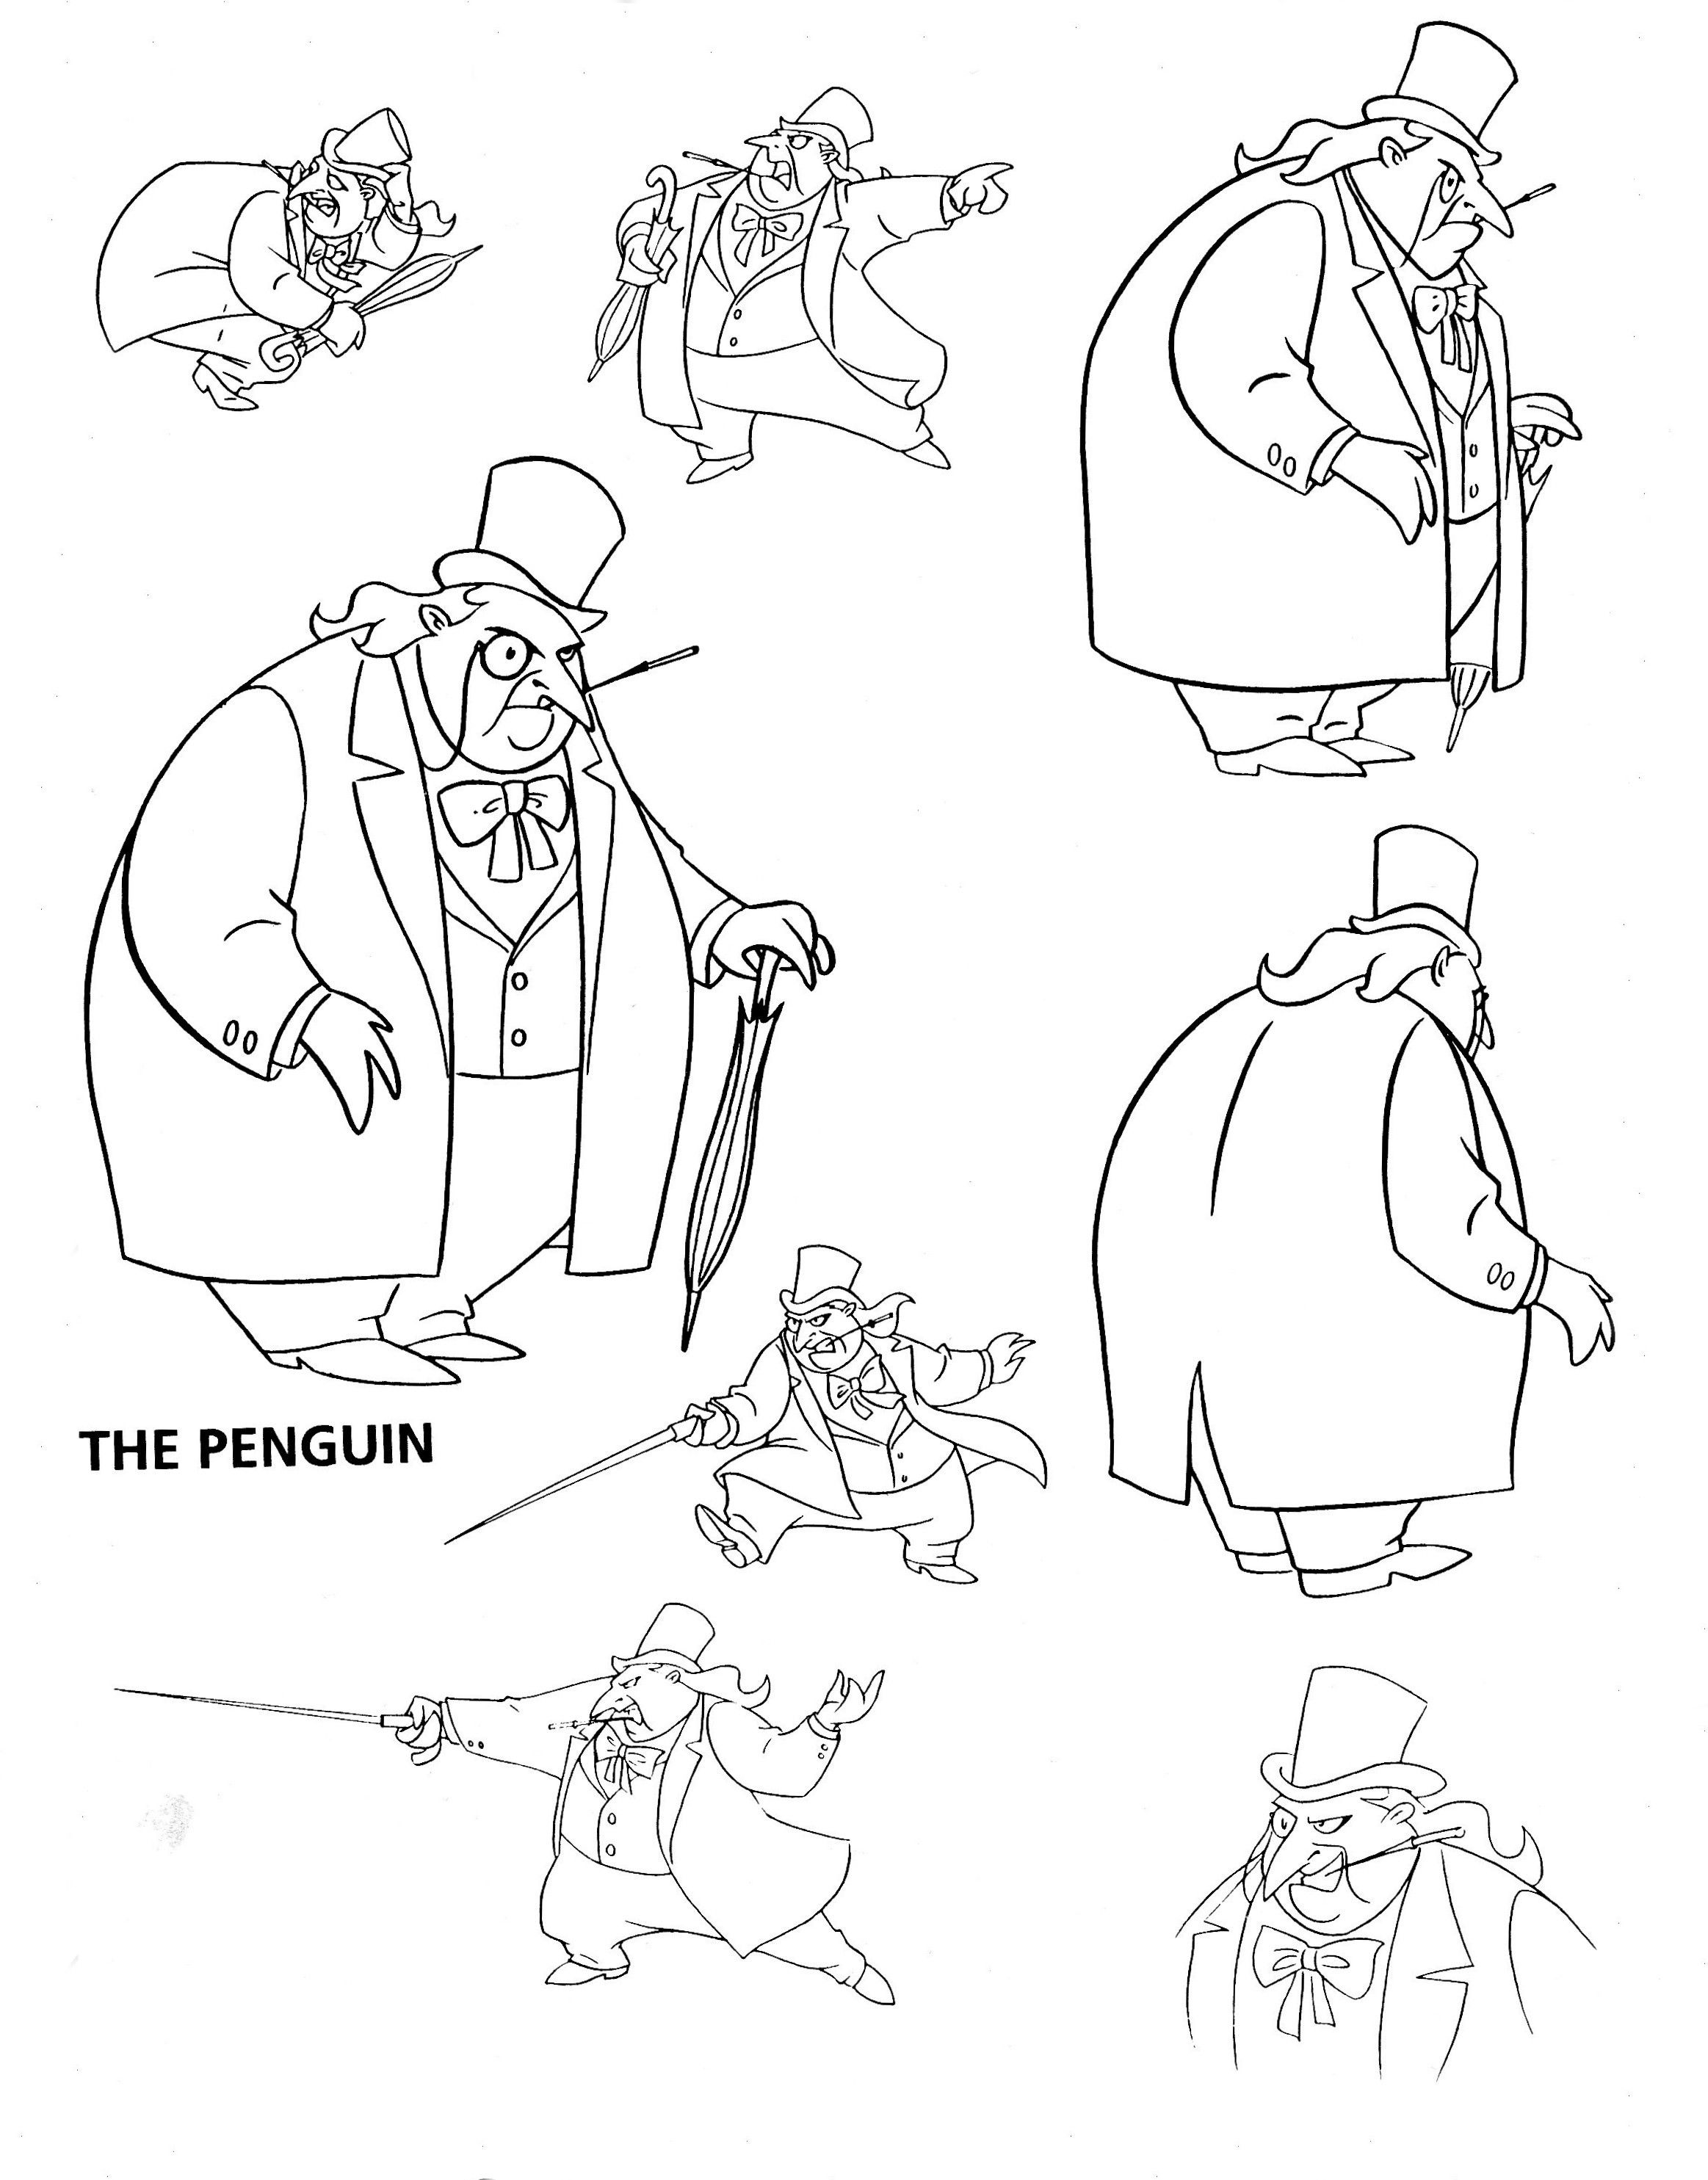 Batman dark knight coloring pages - Penguin In Batman Cartoon Google Search